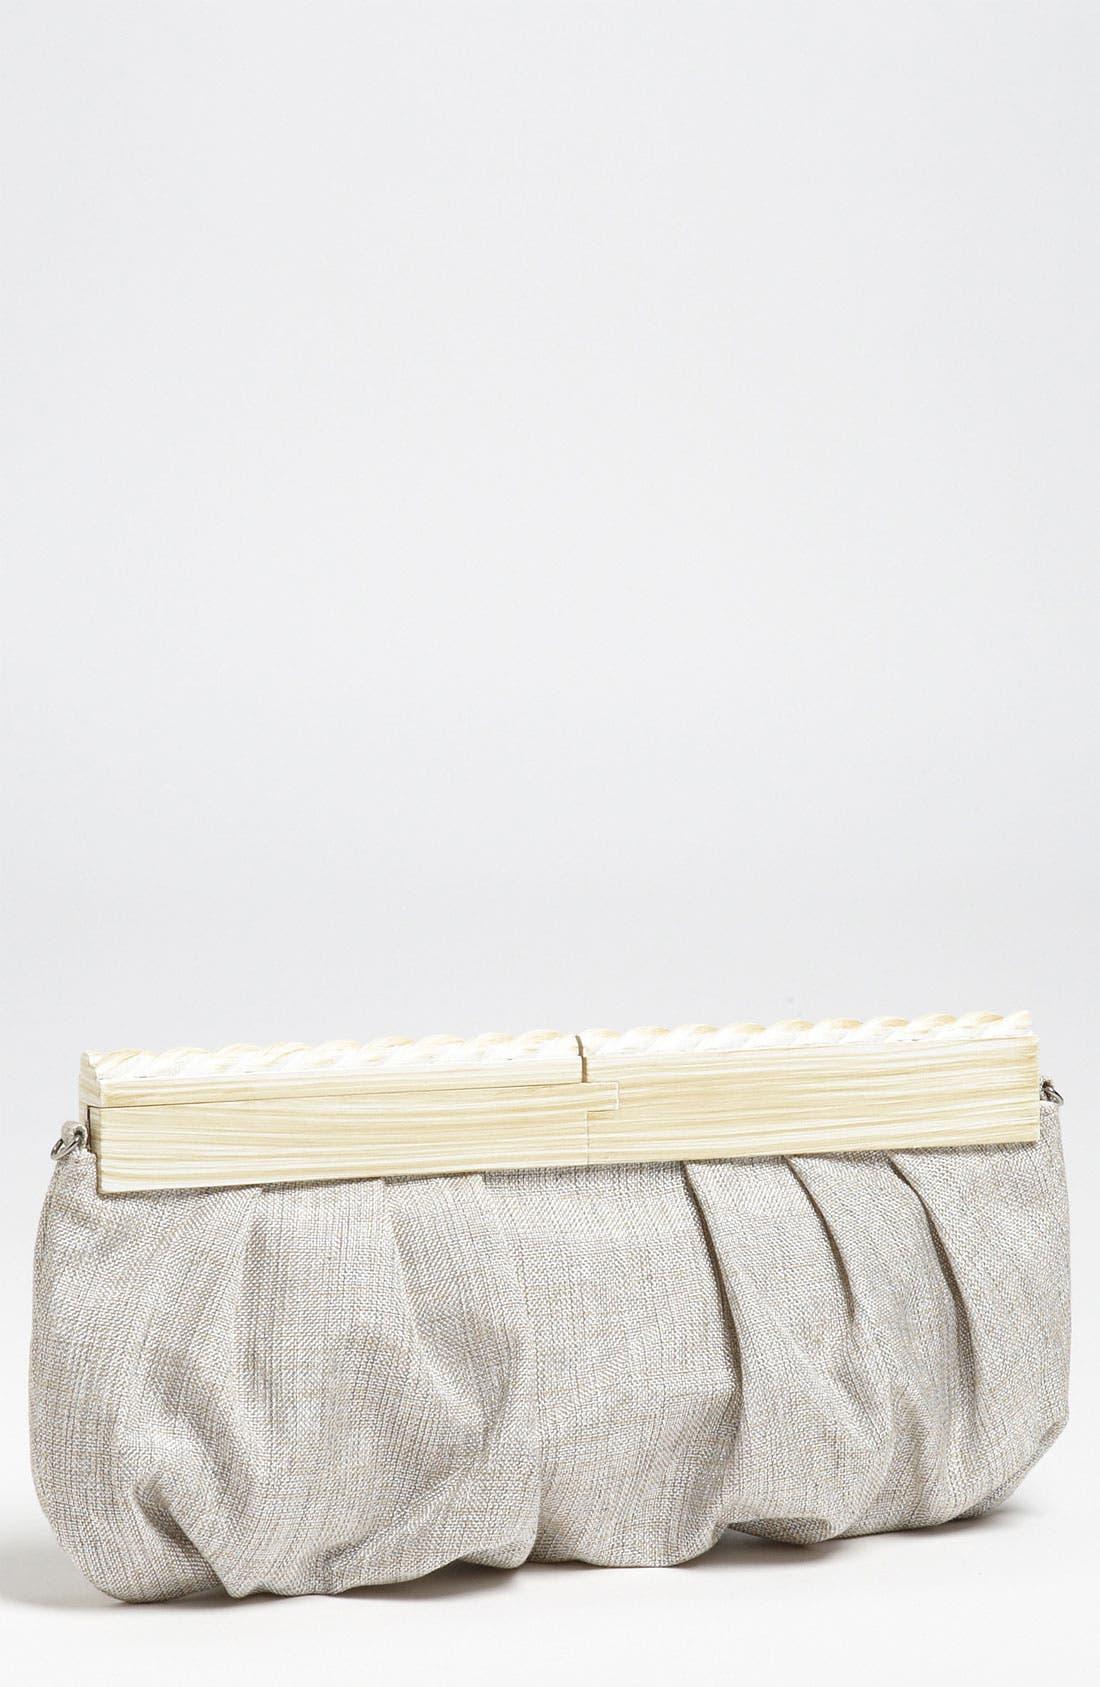 SR Squared by Sondra Roberts Linen & Wood Clutch,                             Main thumbnail 2, color,